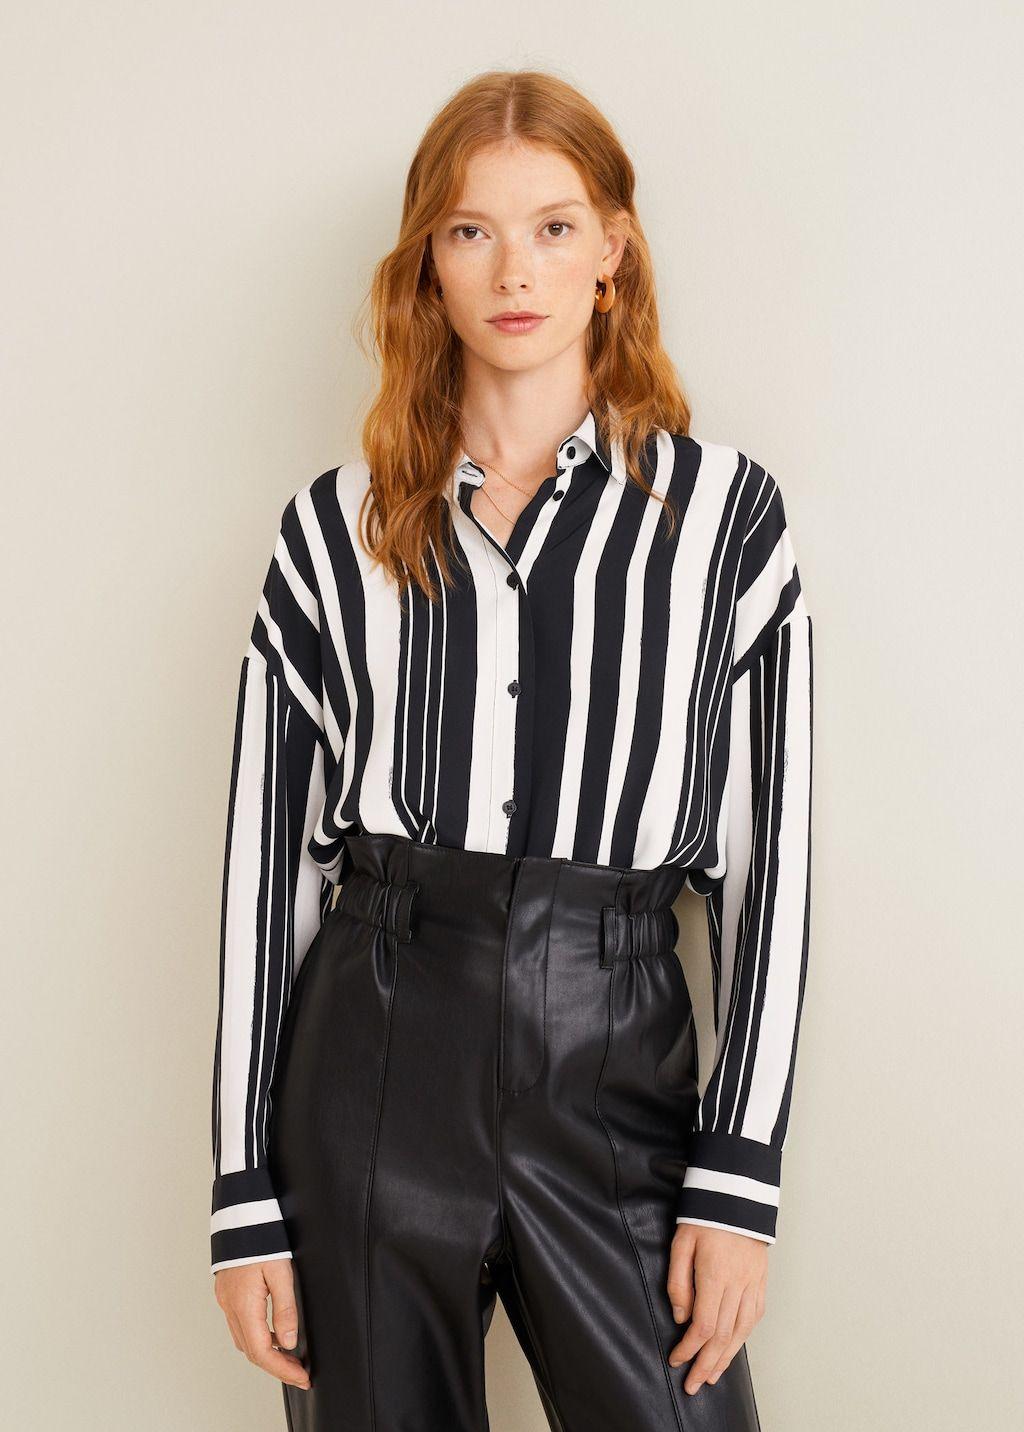 Blouse Of Overhemd.Blouse Met Geometrische Print Dames Blouse Pinterest Blouse